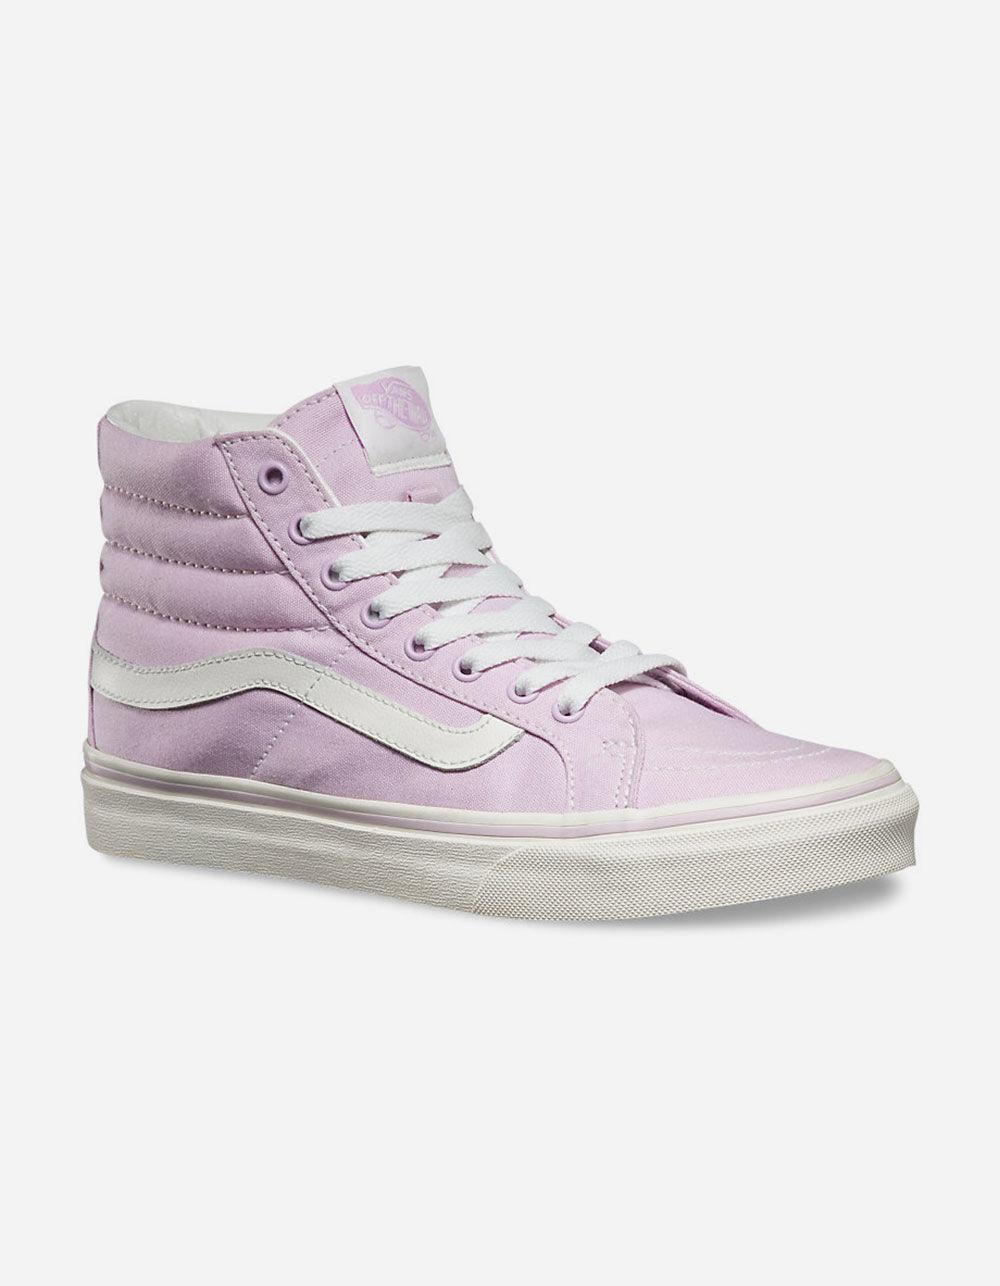 537f4f5bf38bb Lyst - Vans Sk8-hi Slim Womens Shoes